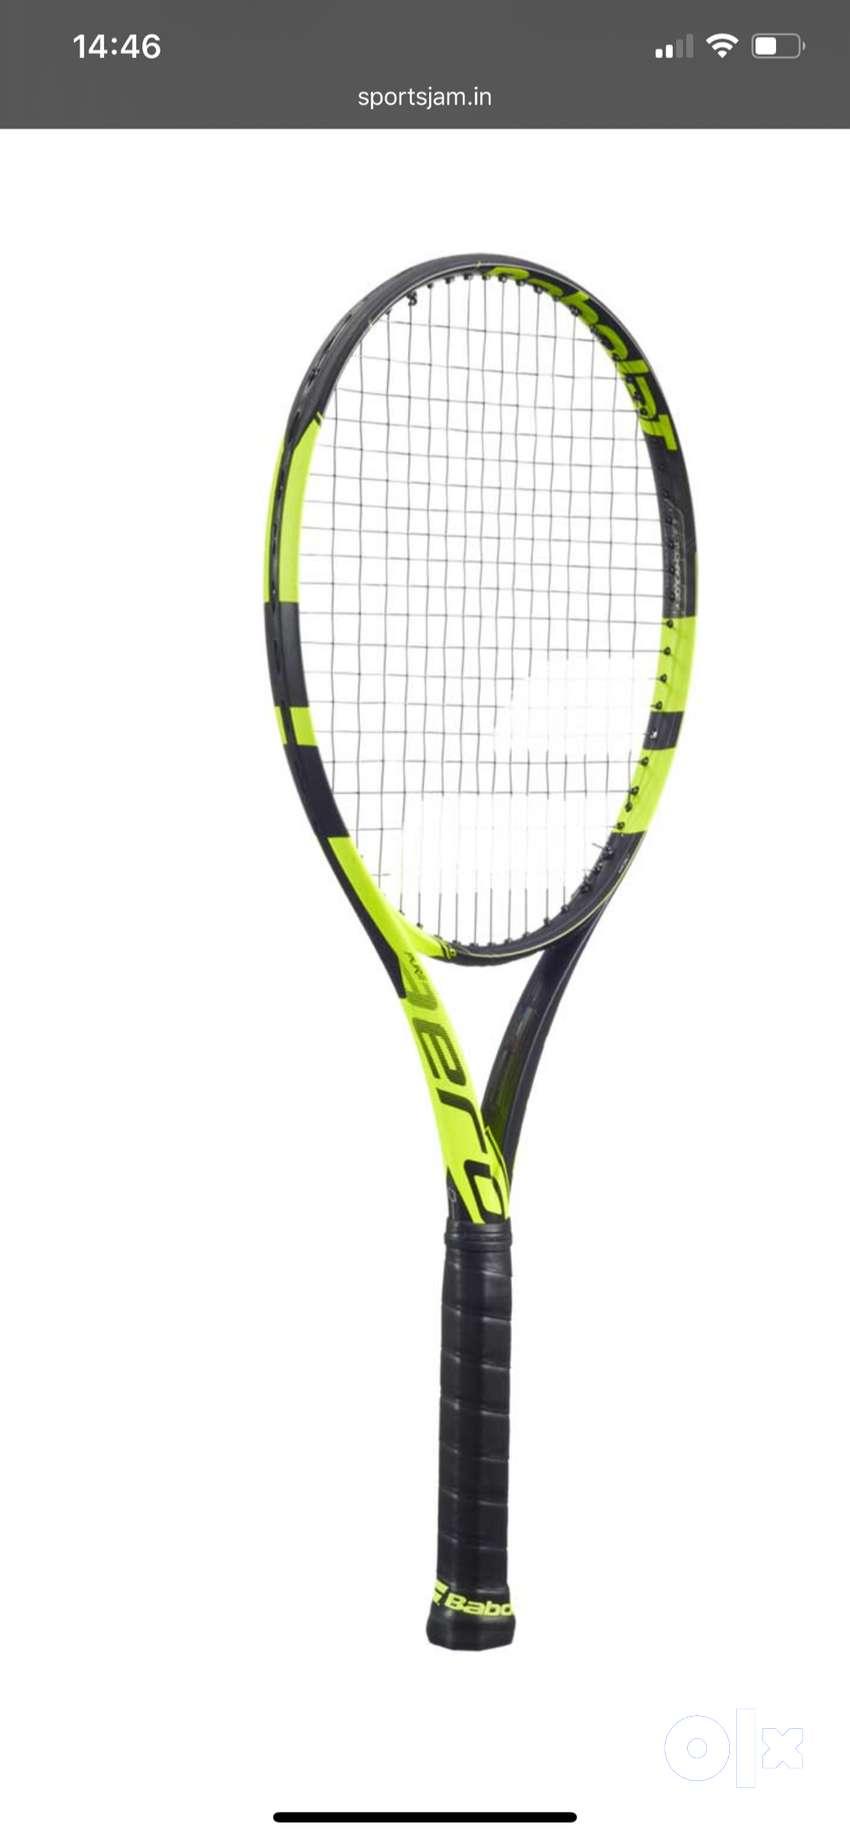 Babalot  tennis racket 0